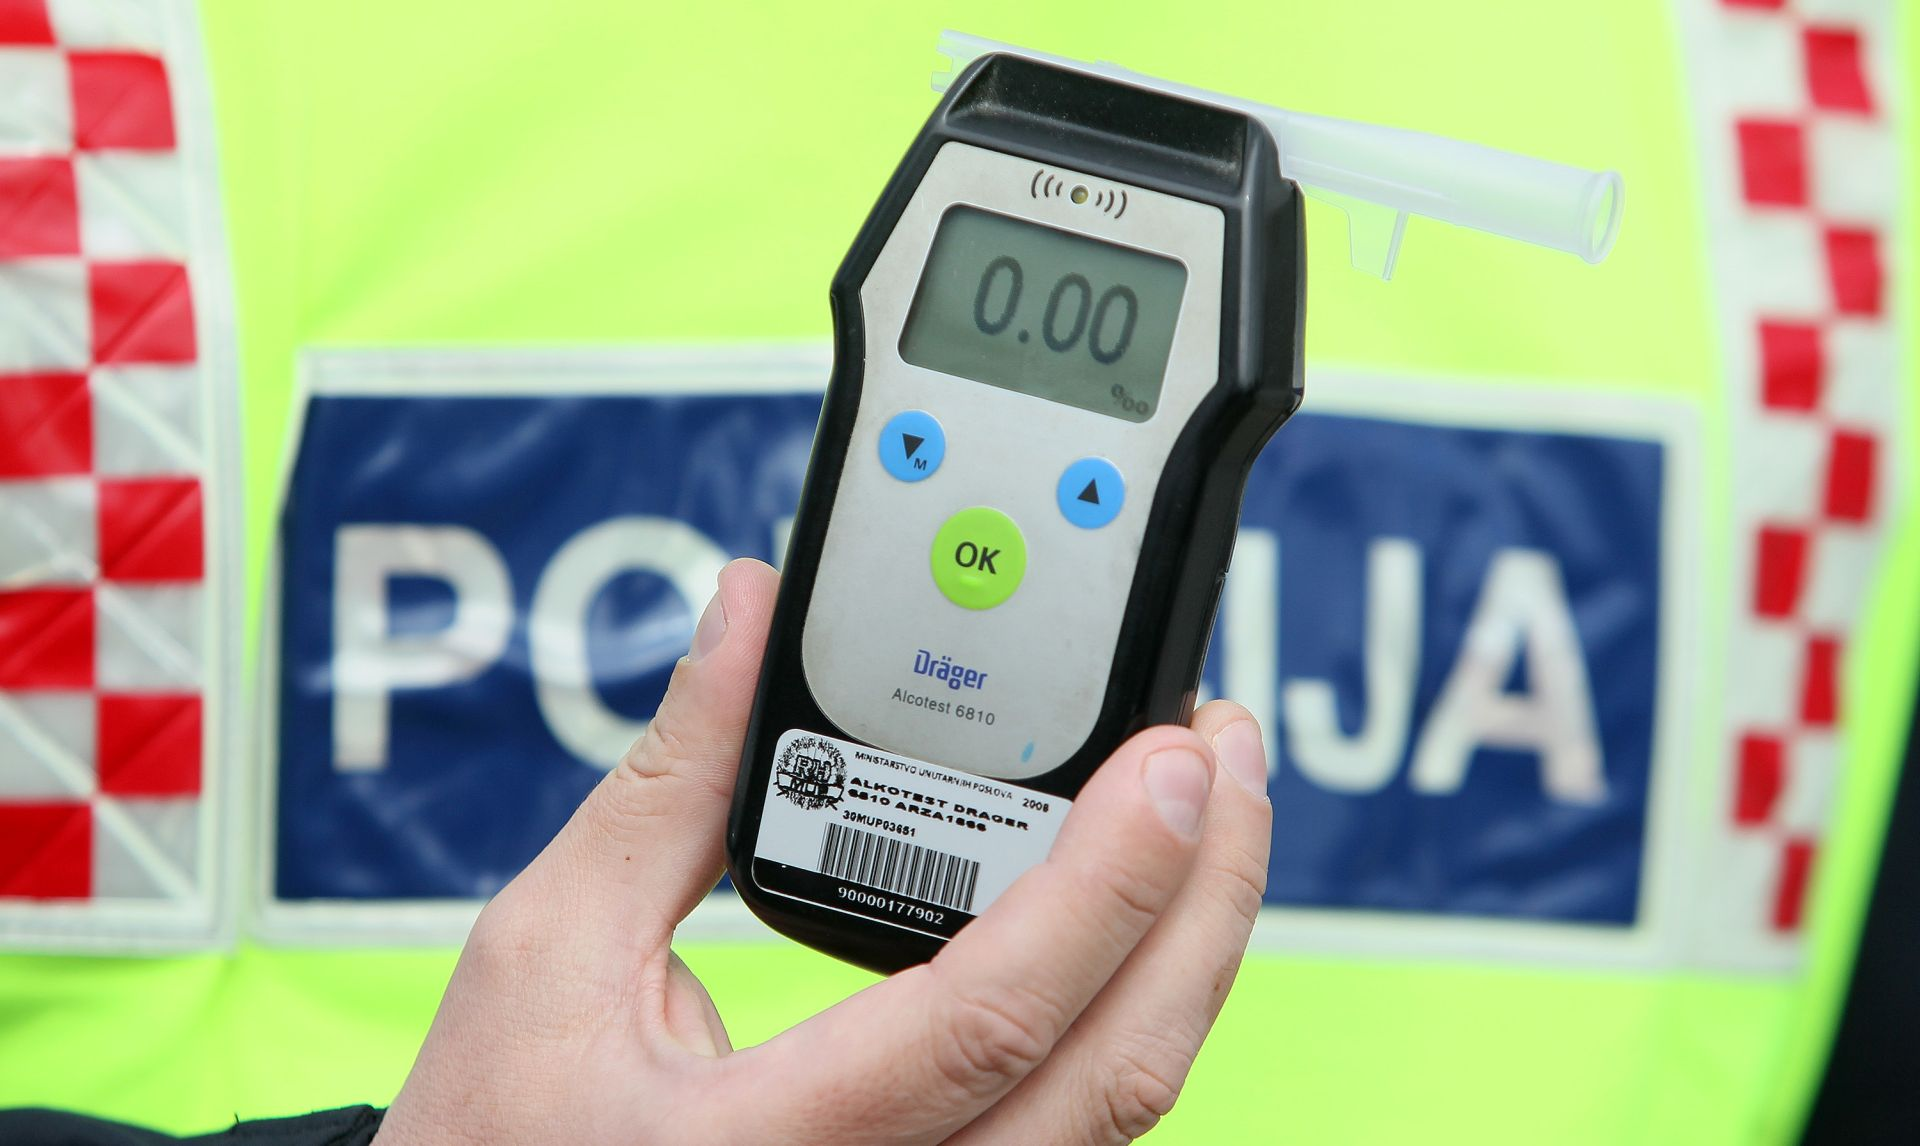 NOVI 'REKORDER' Šibenskom vozaču (38) izmjeren 3,61 promil alkohola u krvi